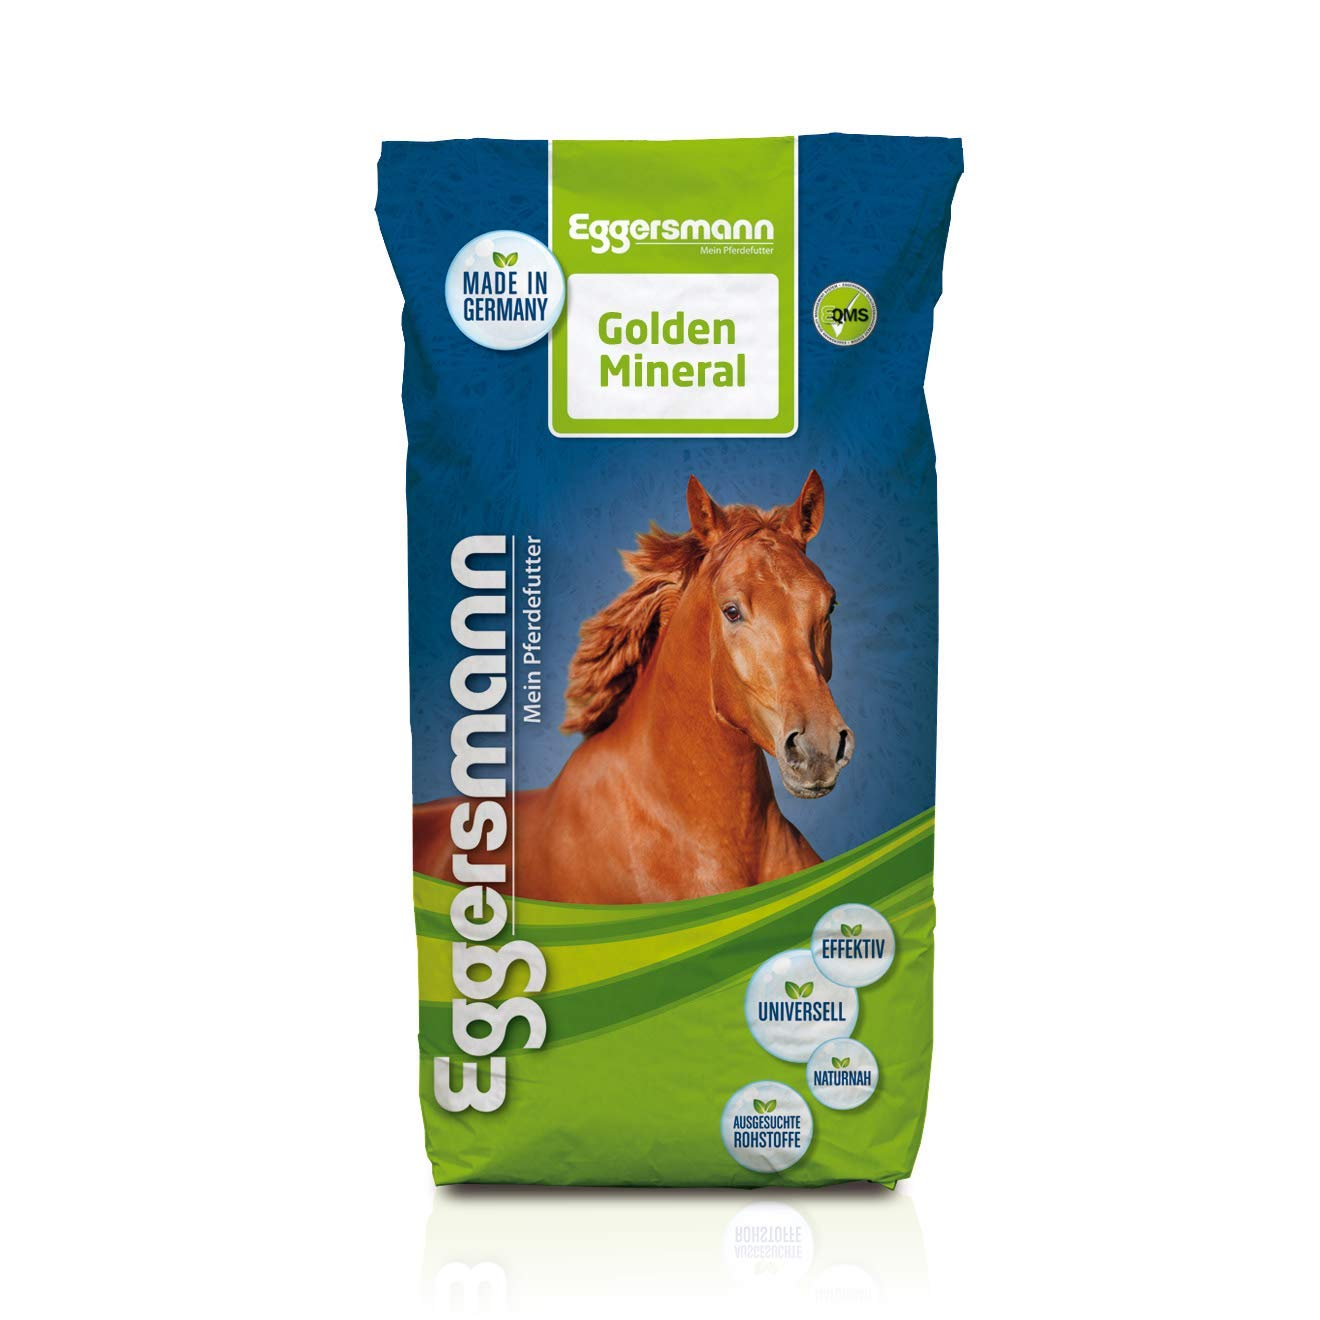 1x Pack Eggersmann golden Mineral for Horses 55lbs